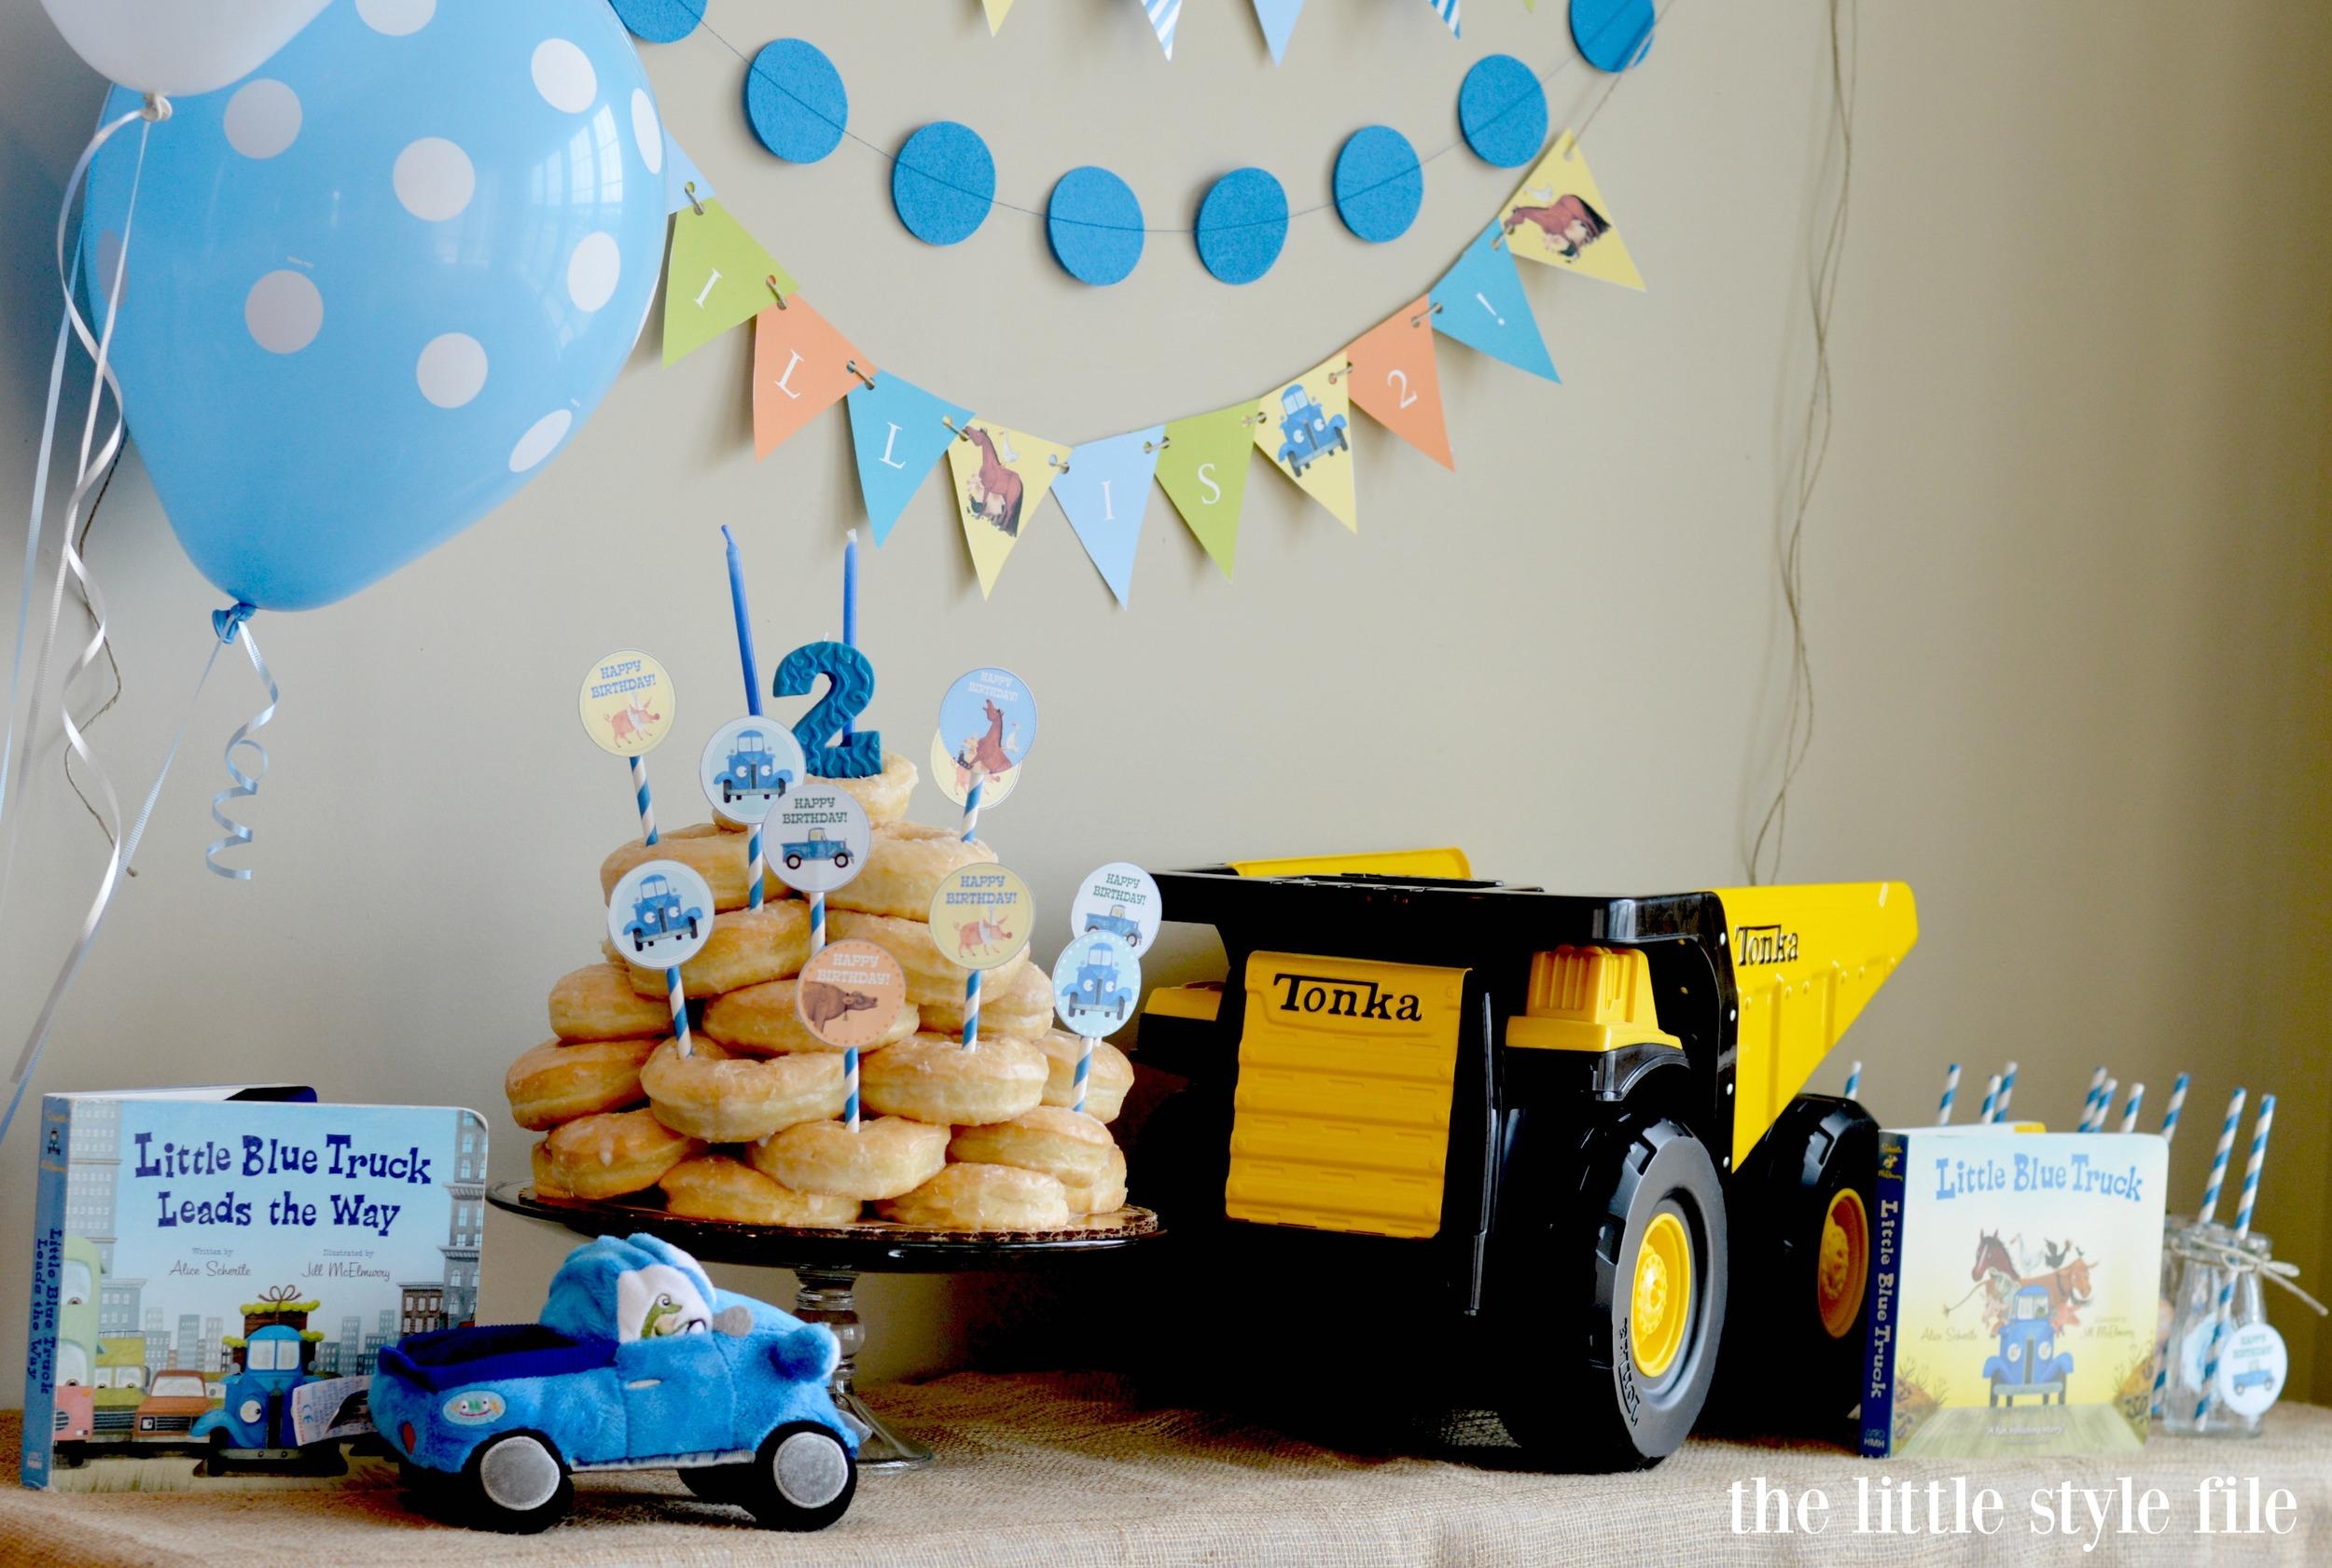 little blue truck party decorations.jpg